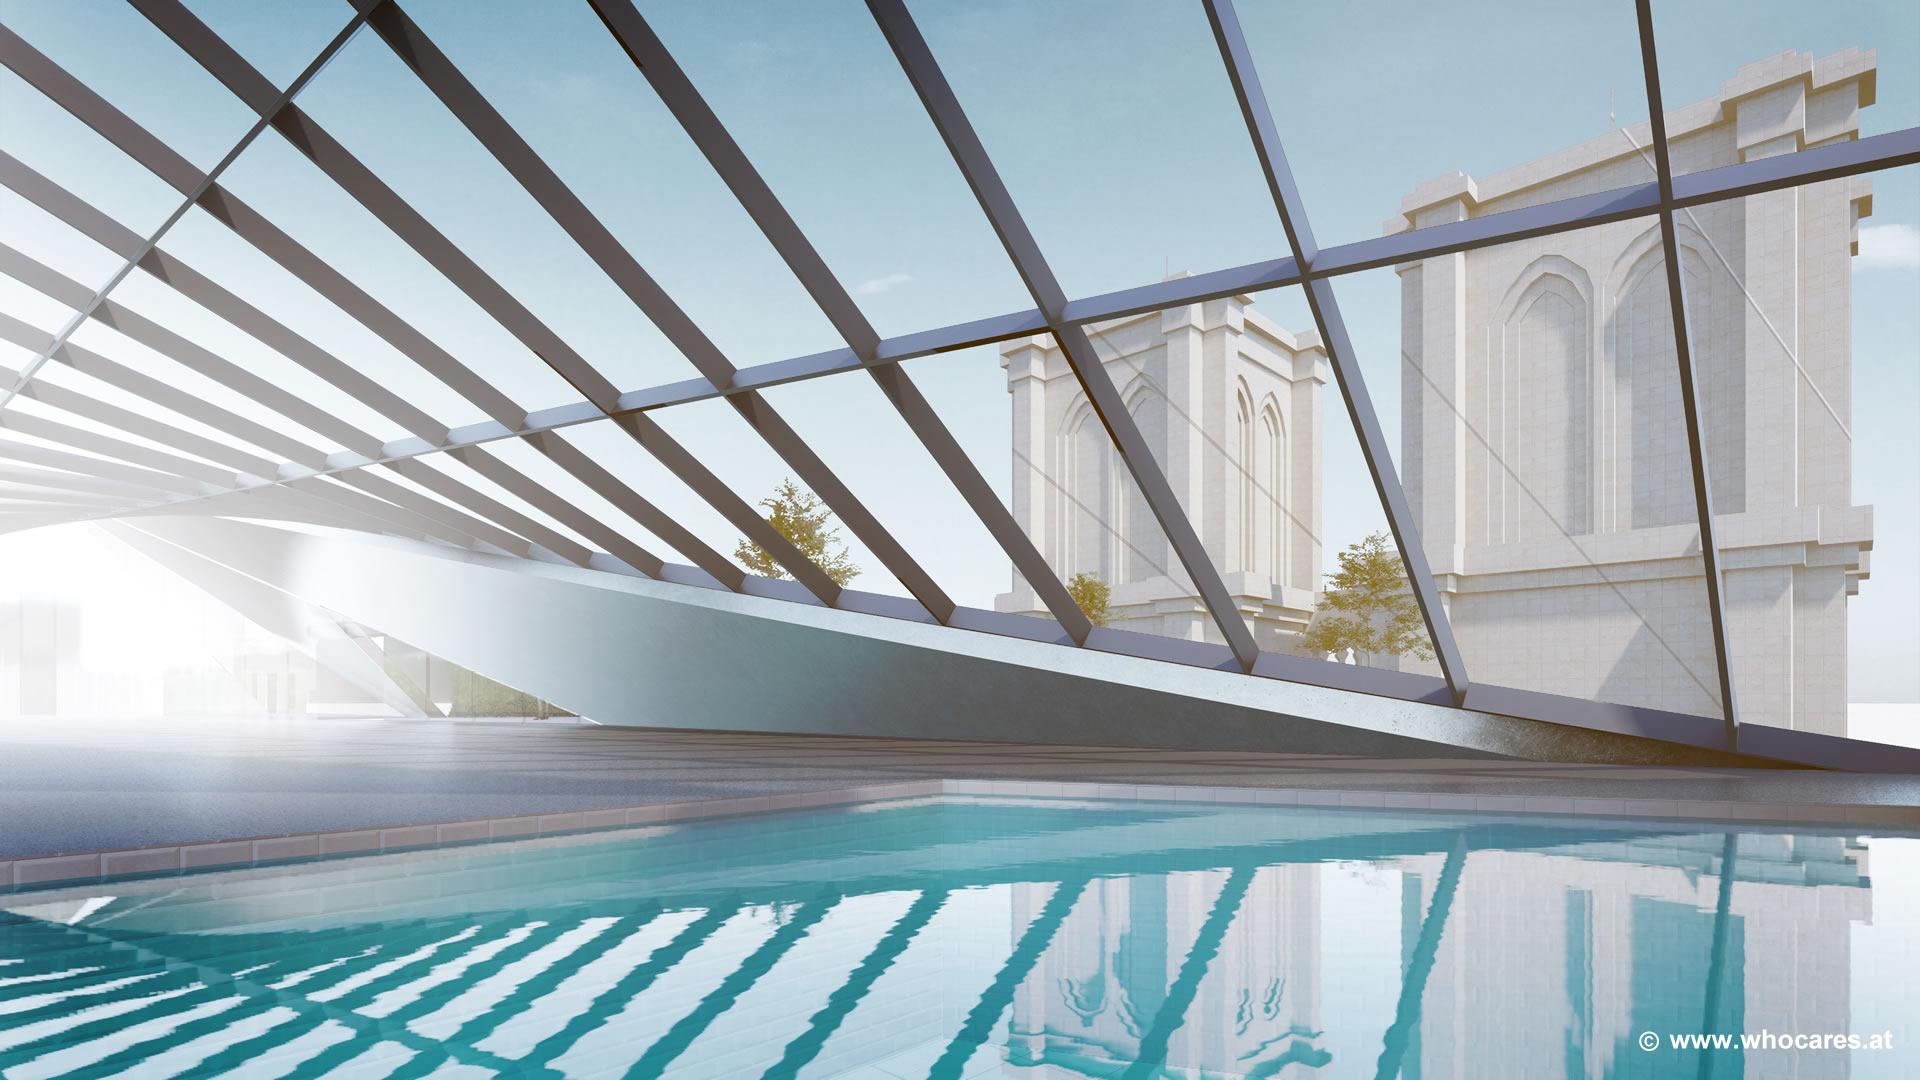 007_notredame_quasimodo_penthouse_indoorpool_by_whocaresdesign.jpg